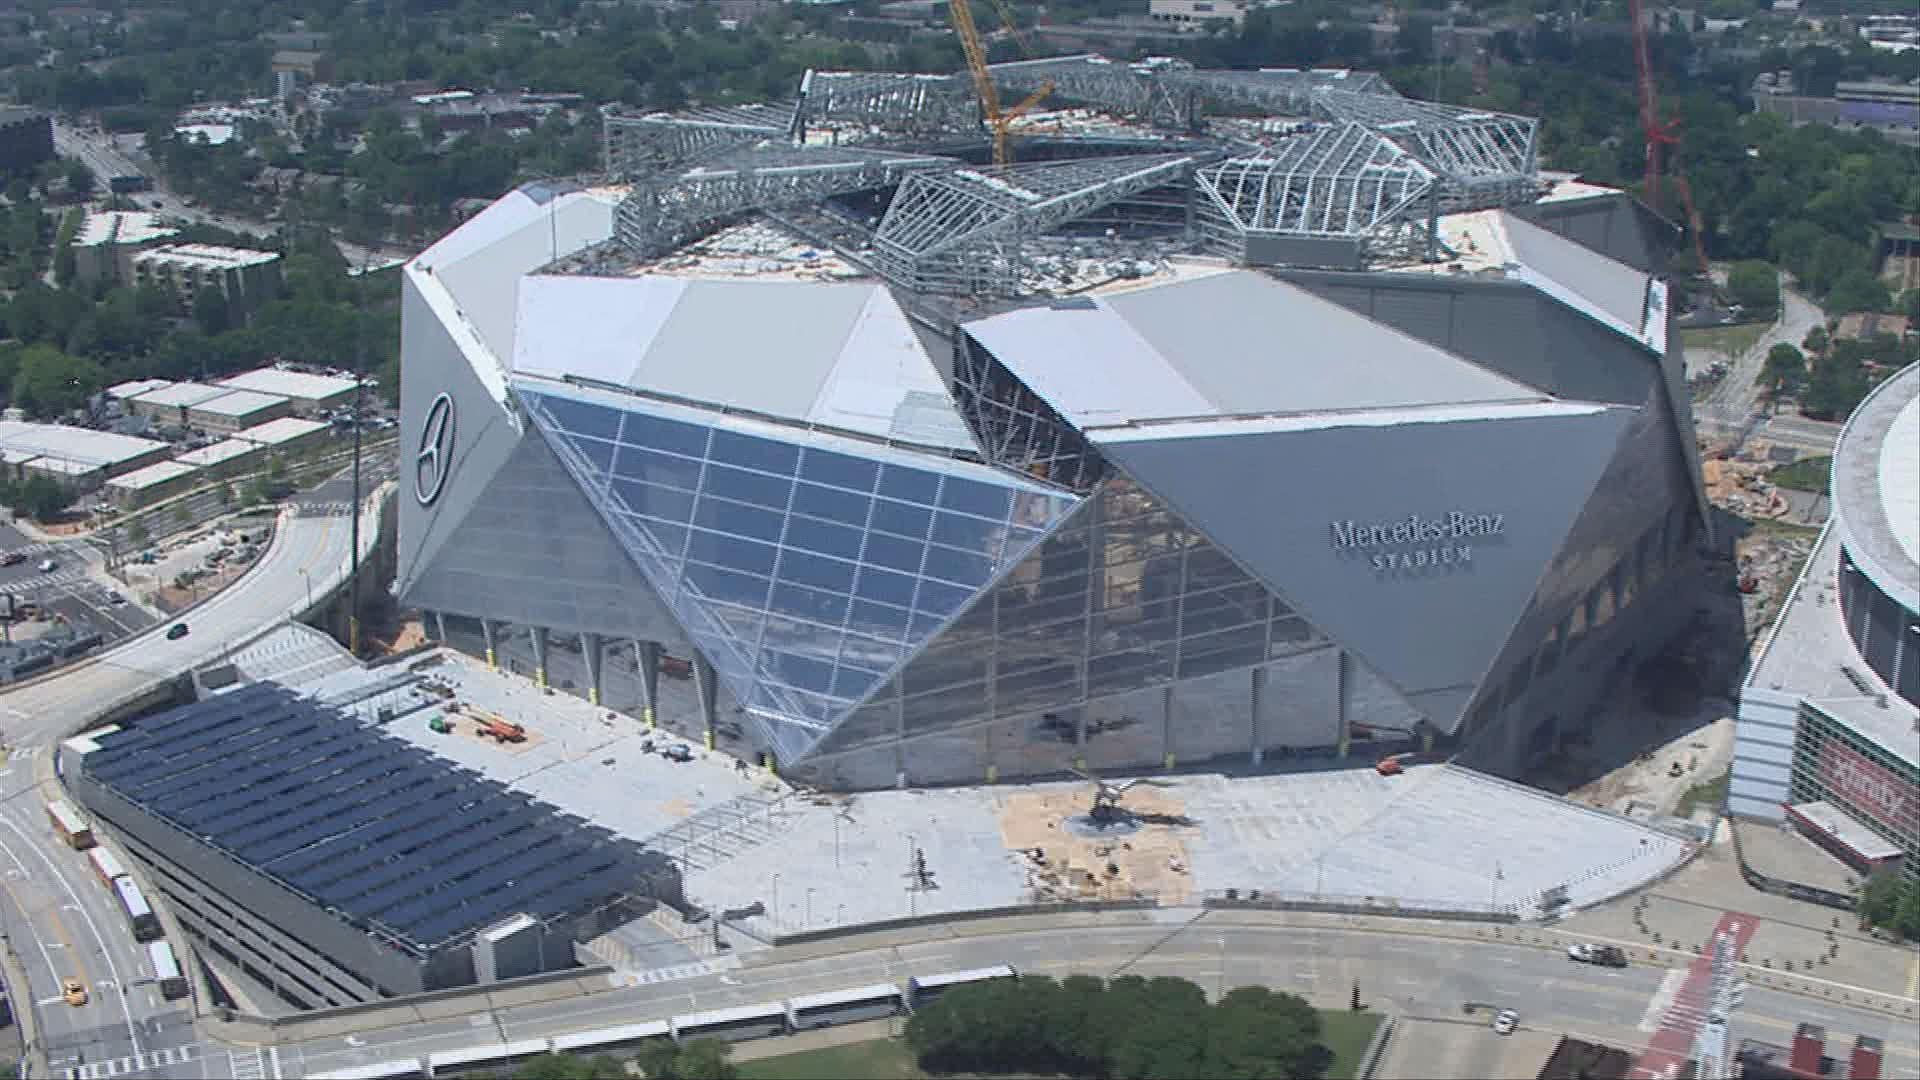 Mercedes benz stadium opens its doors full for Mercedes benz stadium atlanta jobs